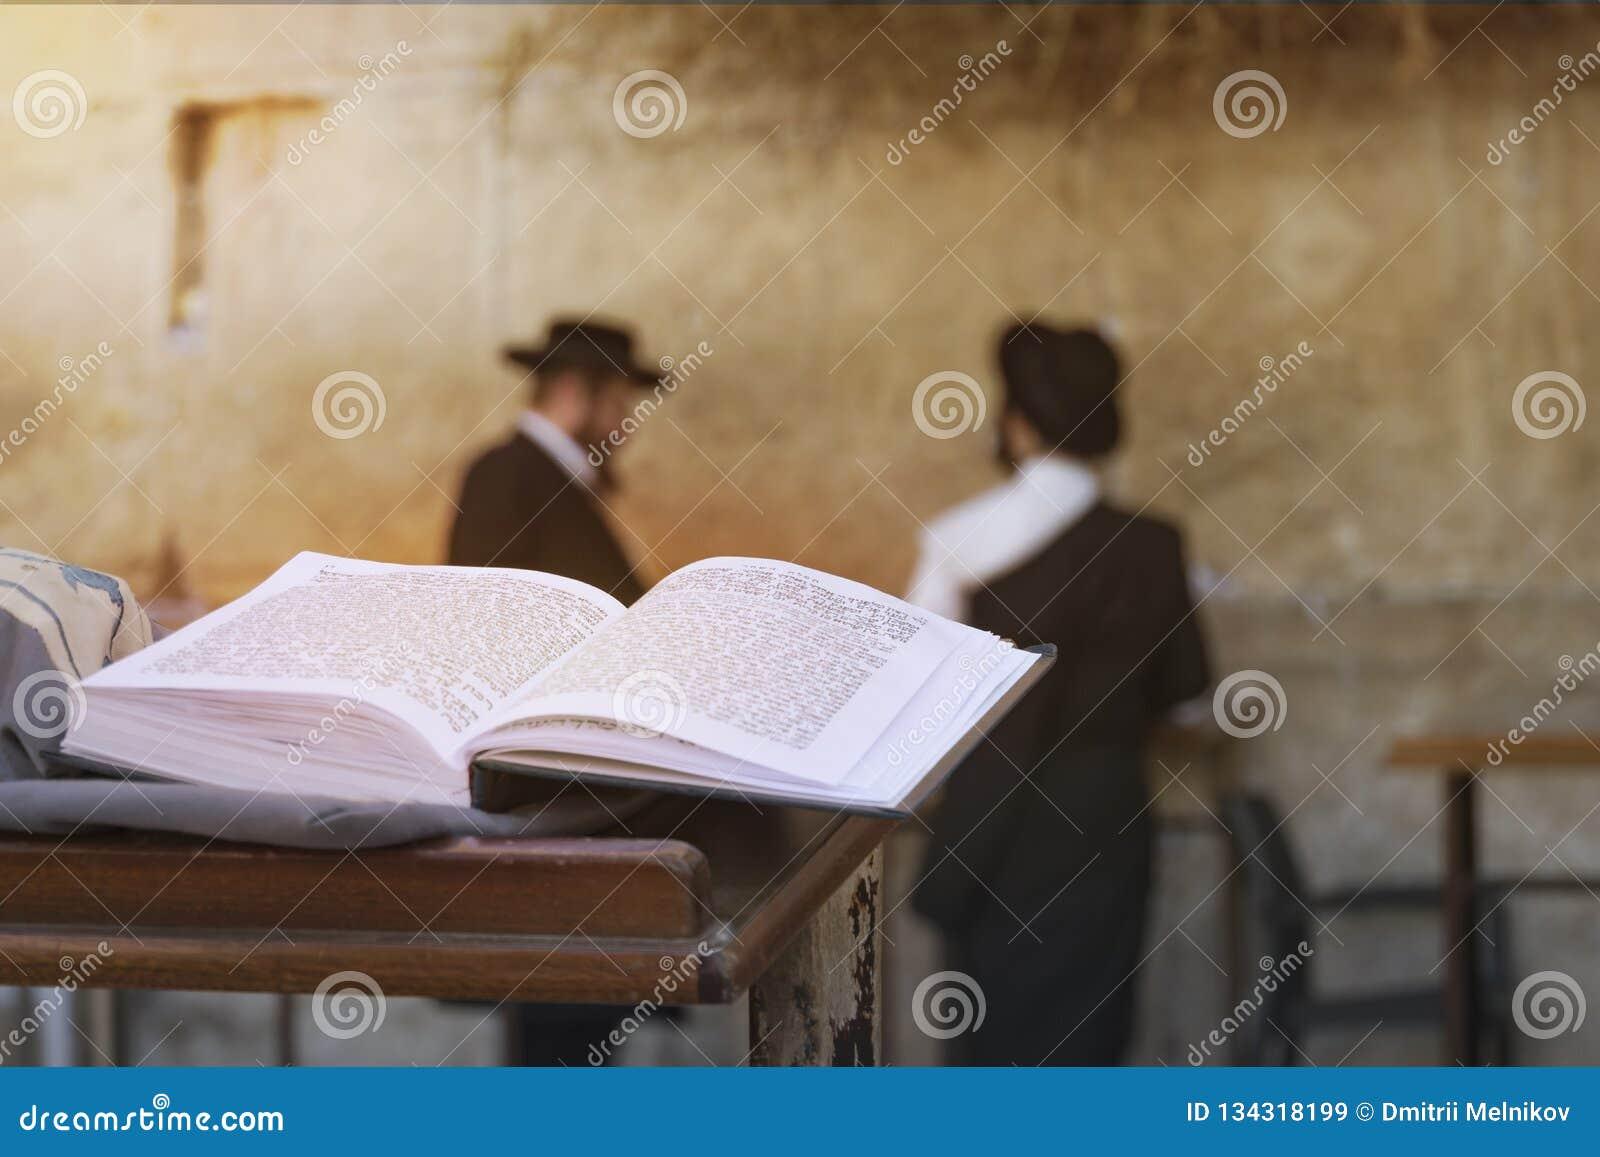 Bibbia ebrea sulla tavola, parete occidentale lamentantesi, Gerusalemme, Israele il libro del Torah-the Pentateuch di Mosè è aper